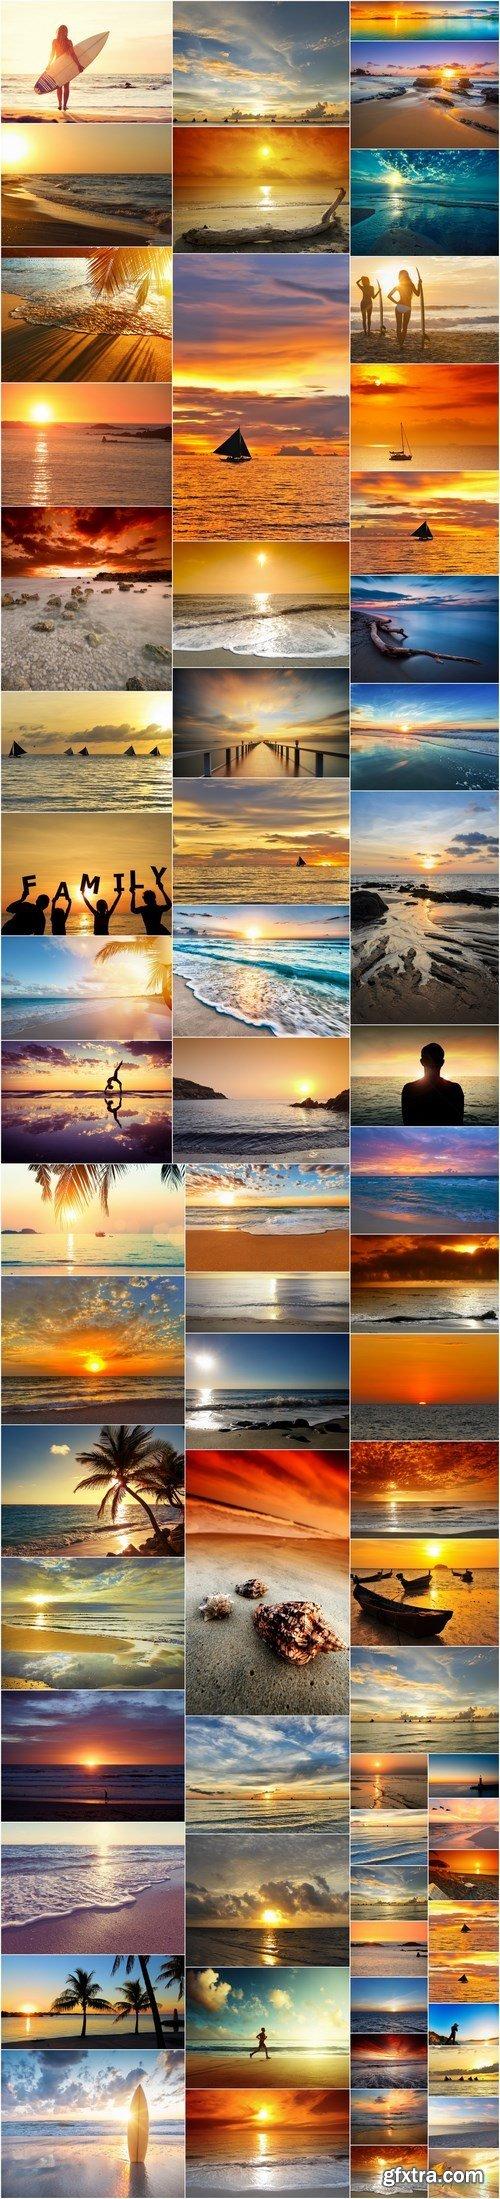 Beautiful Sunset and Sunrise at Beach - Set of 66xUHQ JPEG Professional Stock Images